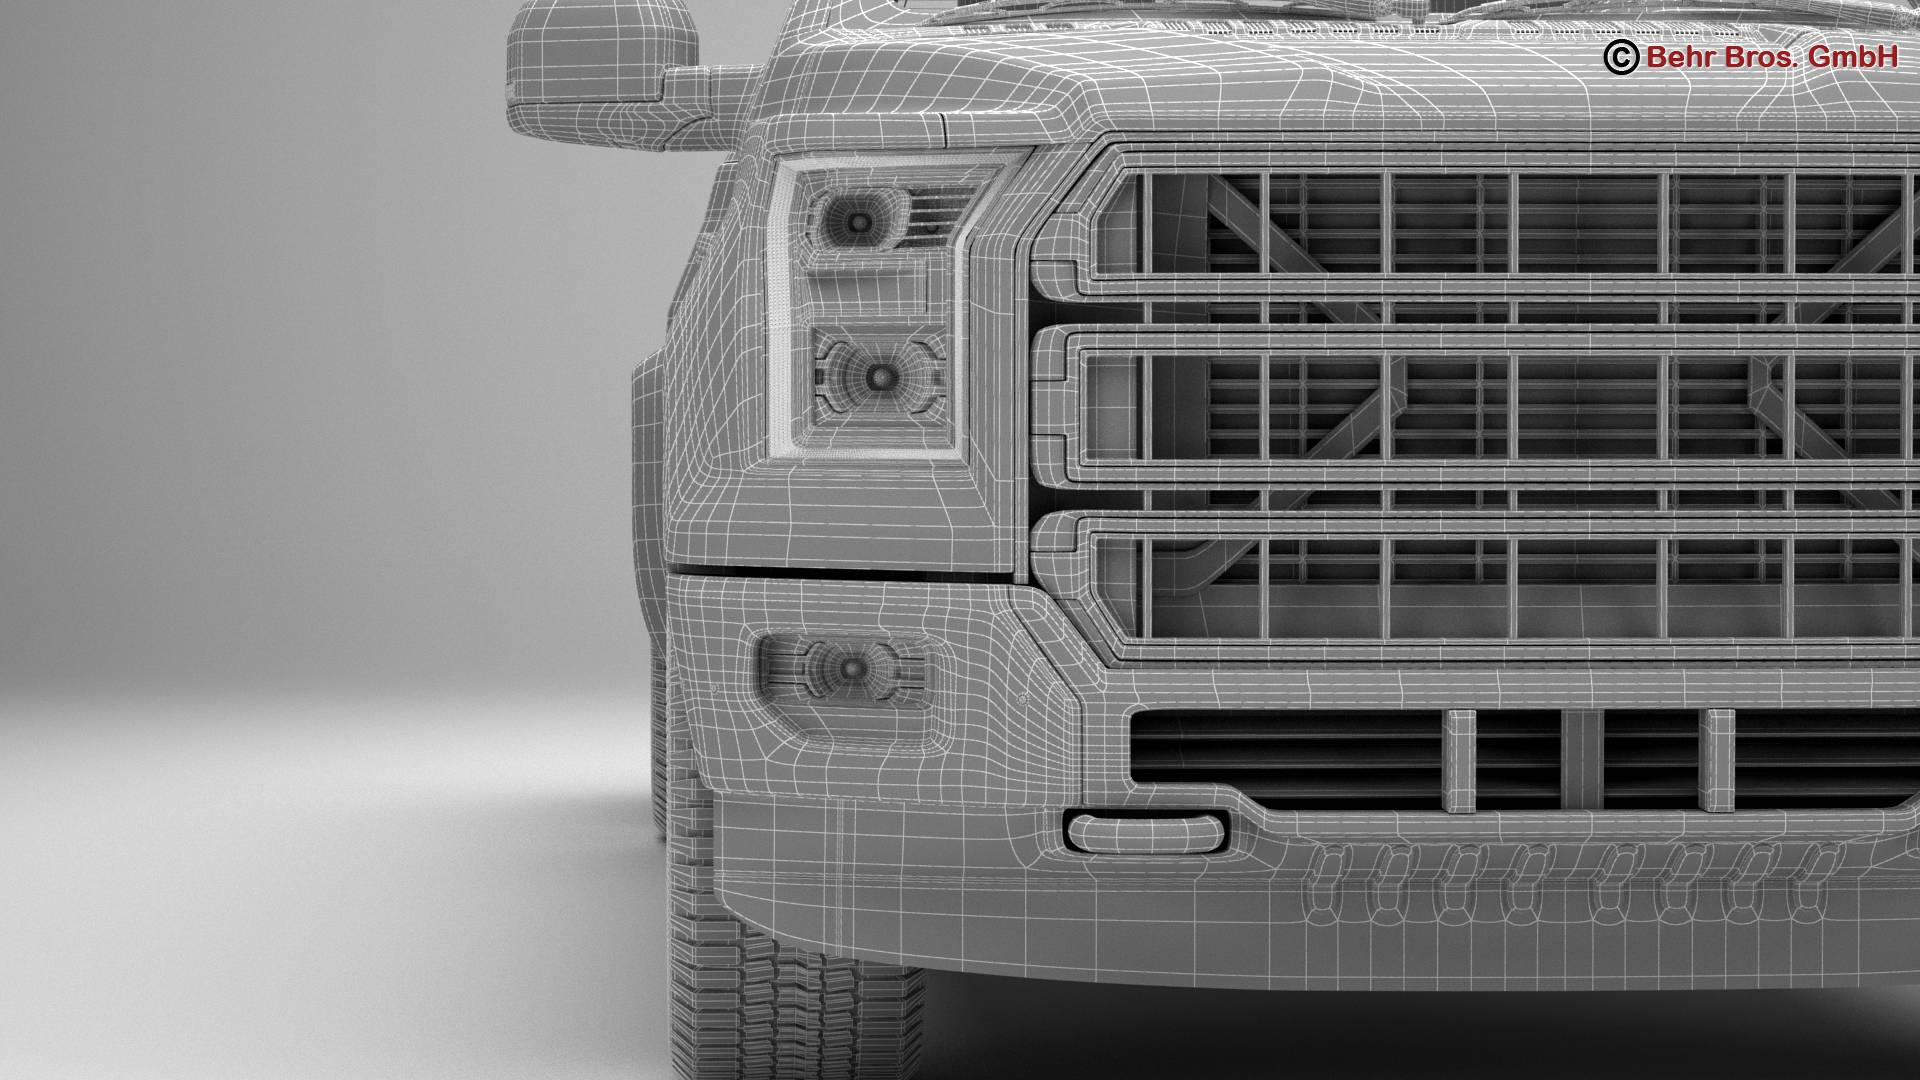 generic pickup 3d model 3ds max fbx c4d lwo ma mb obj 219889